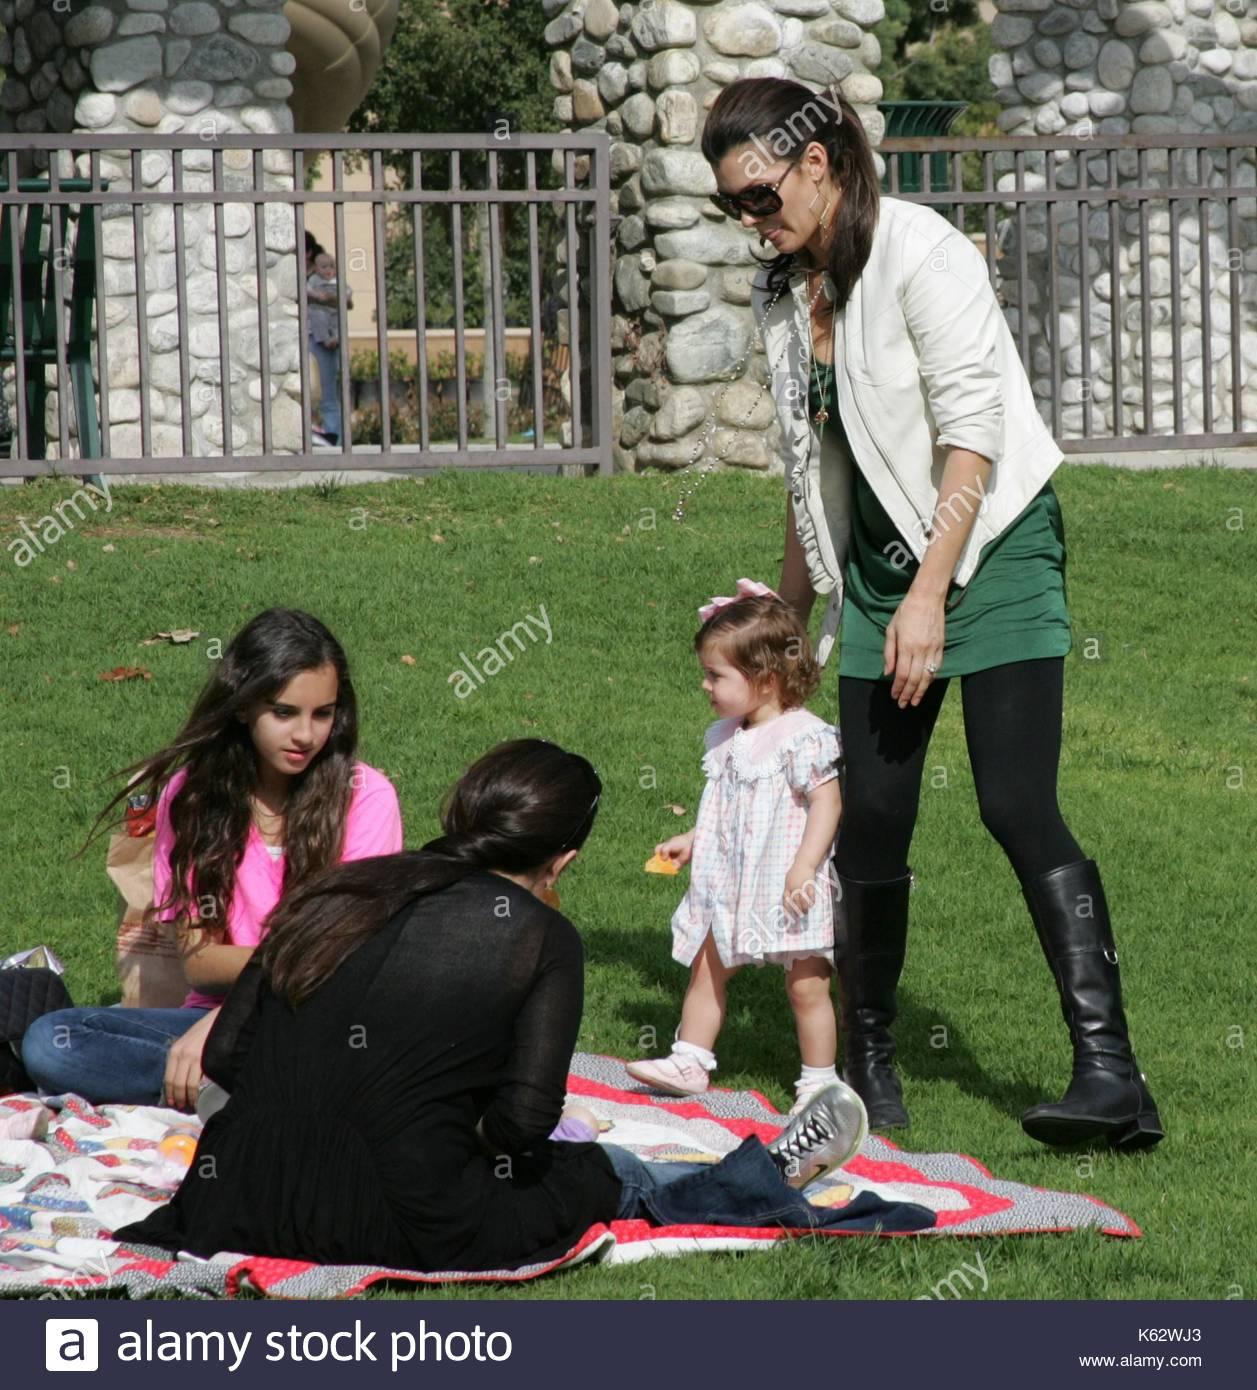 Ali landry car interior design - Ali Landry And Daughter Estela Ali Landry And Daughter Estela At The Park